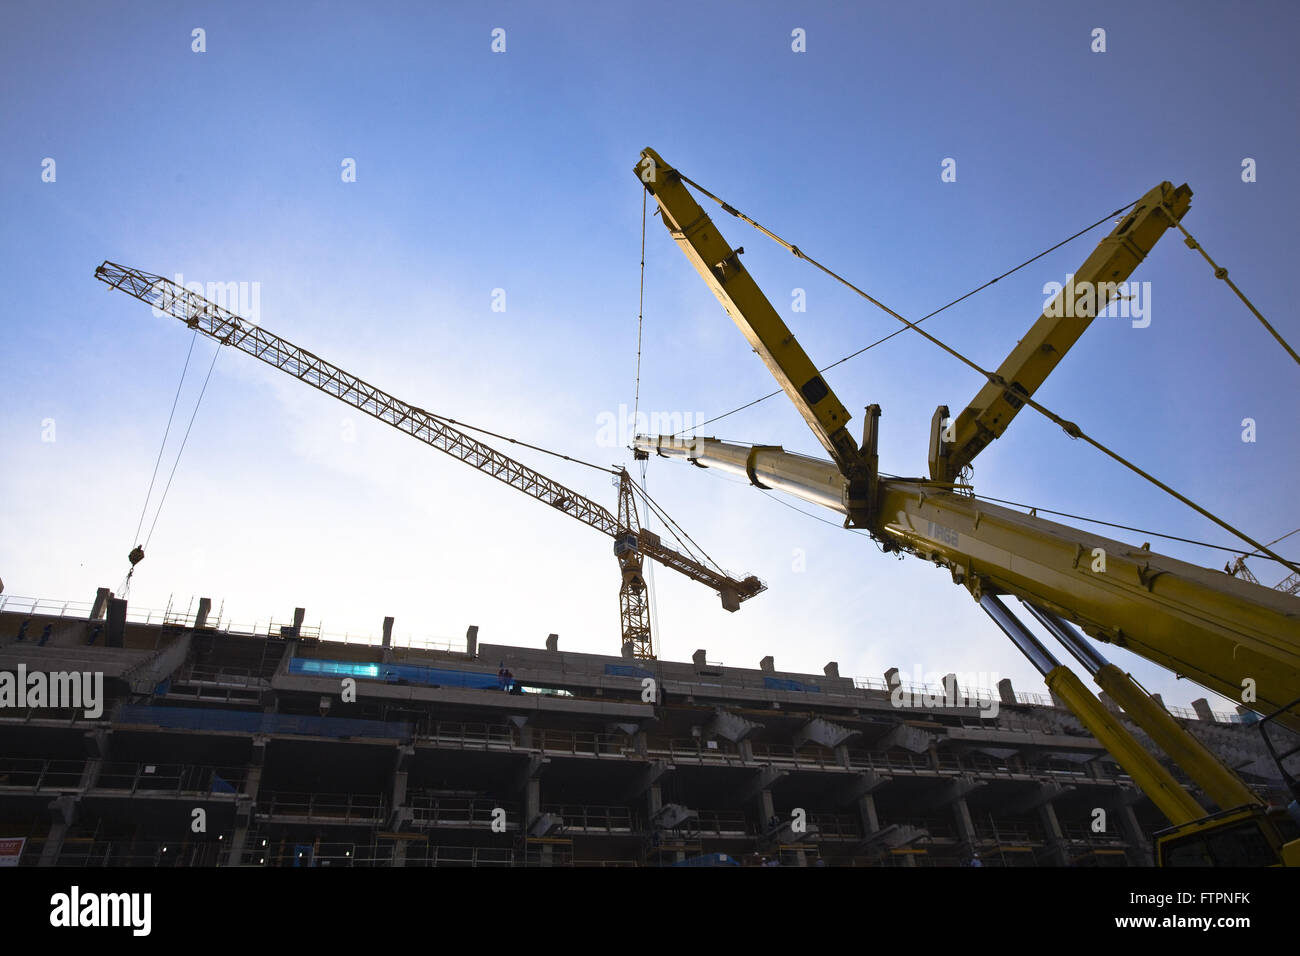 Launcher crane and concrete in construction work of the Corinthians stadium Arena Stock Photo